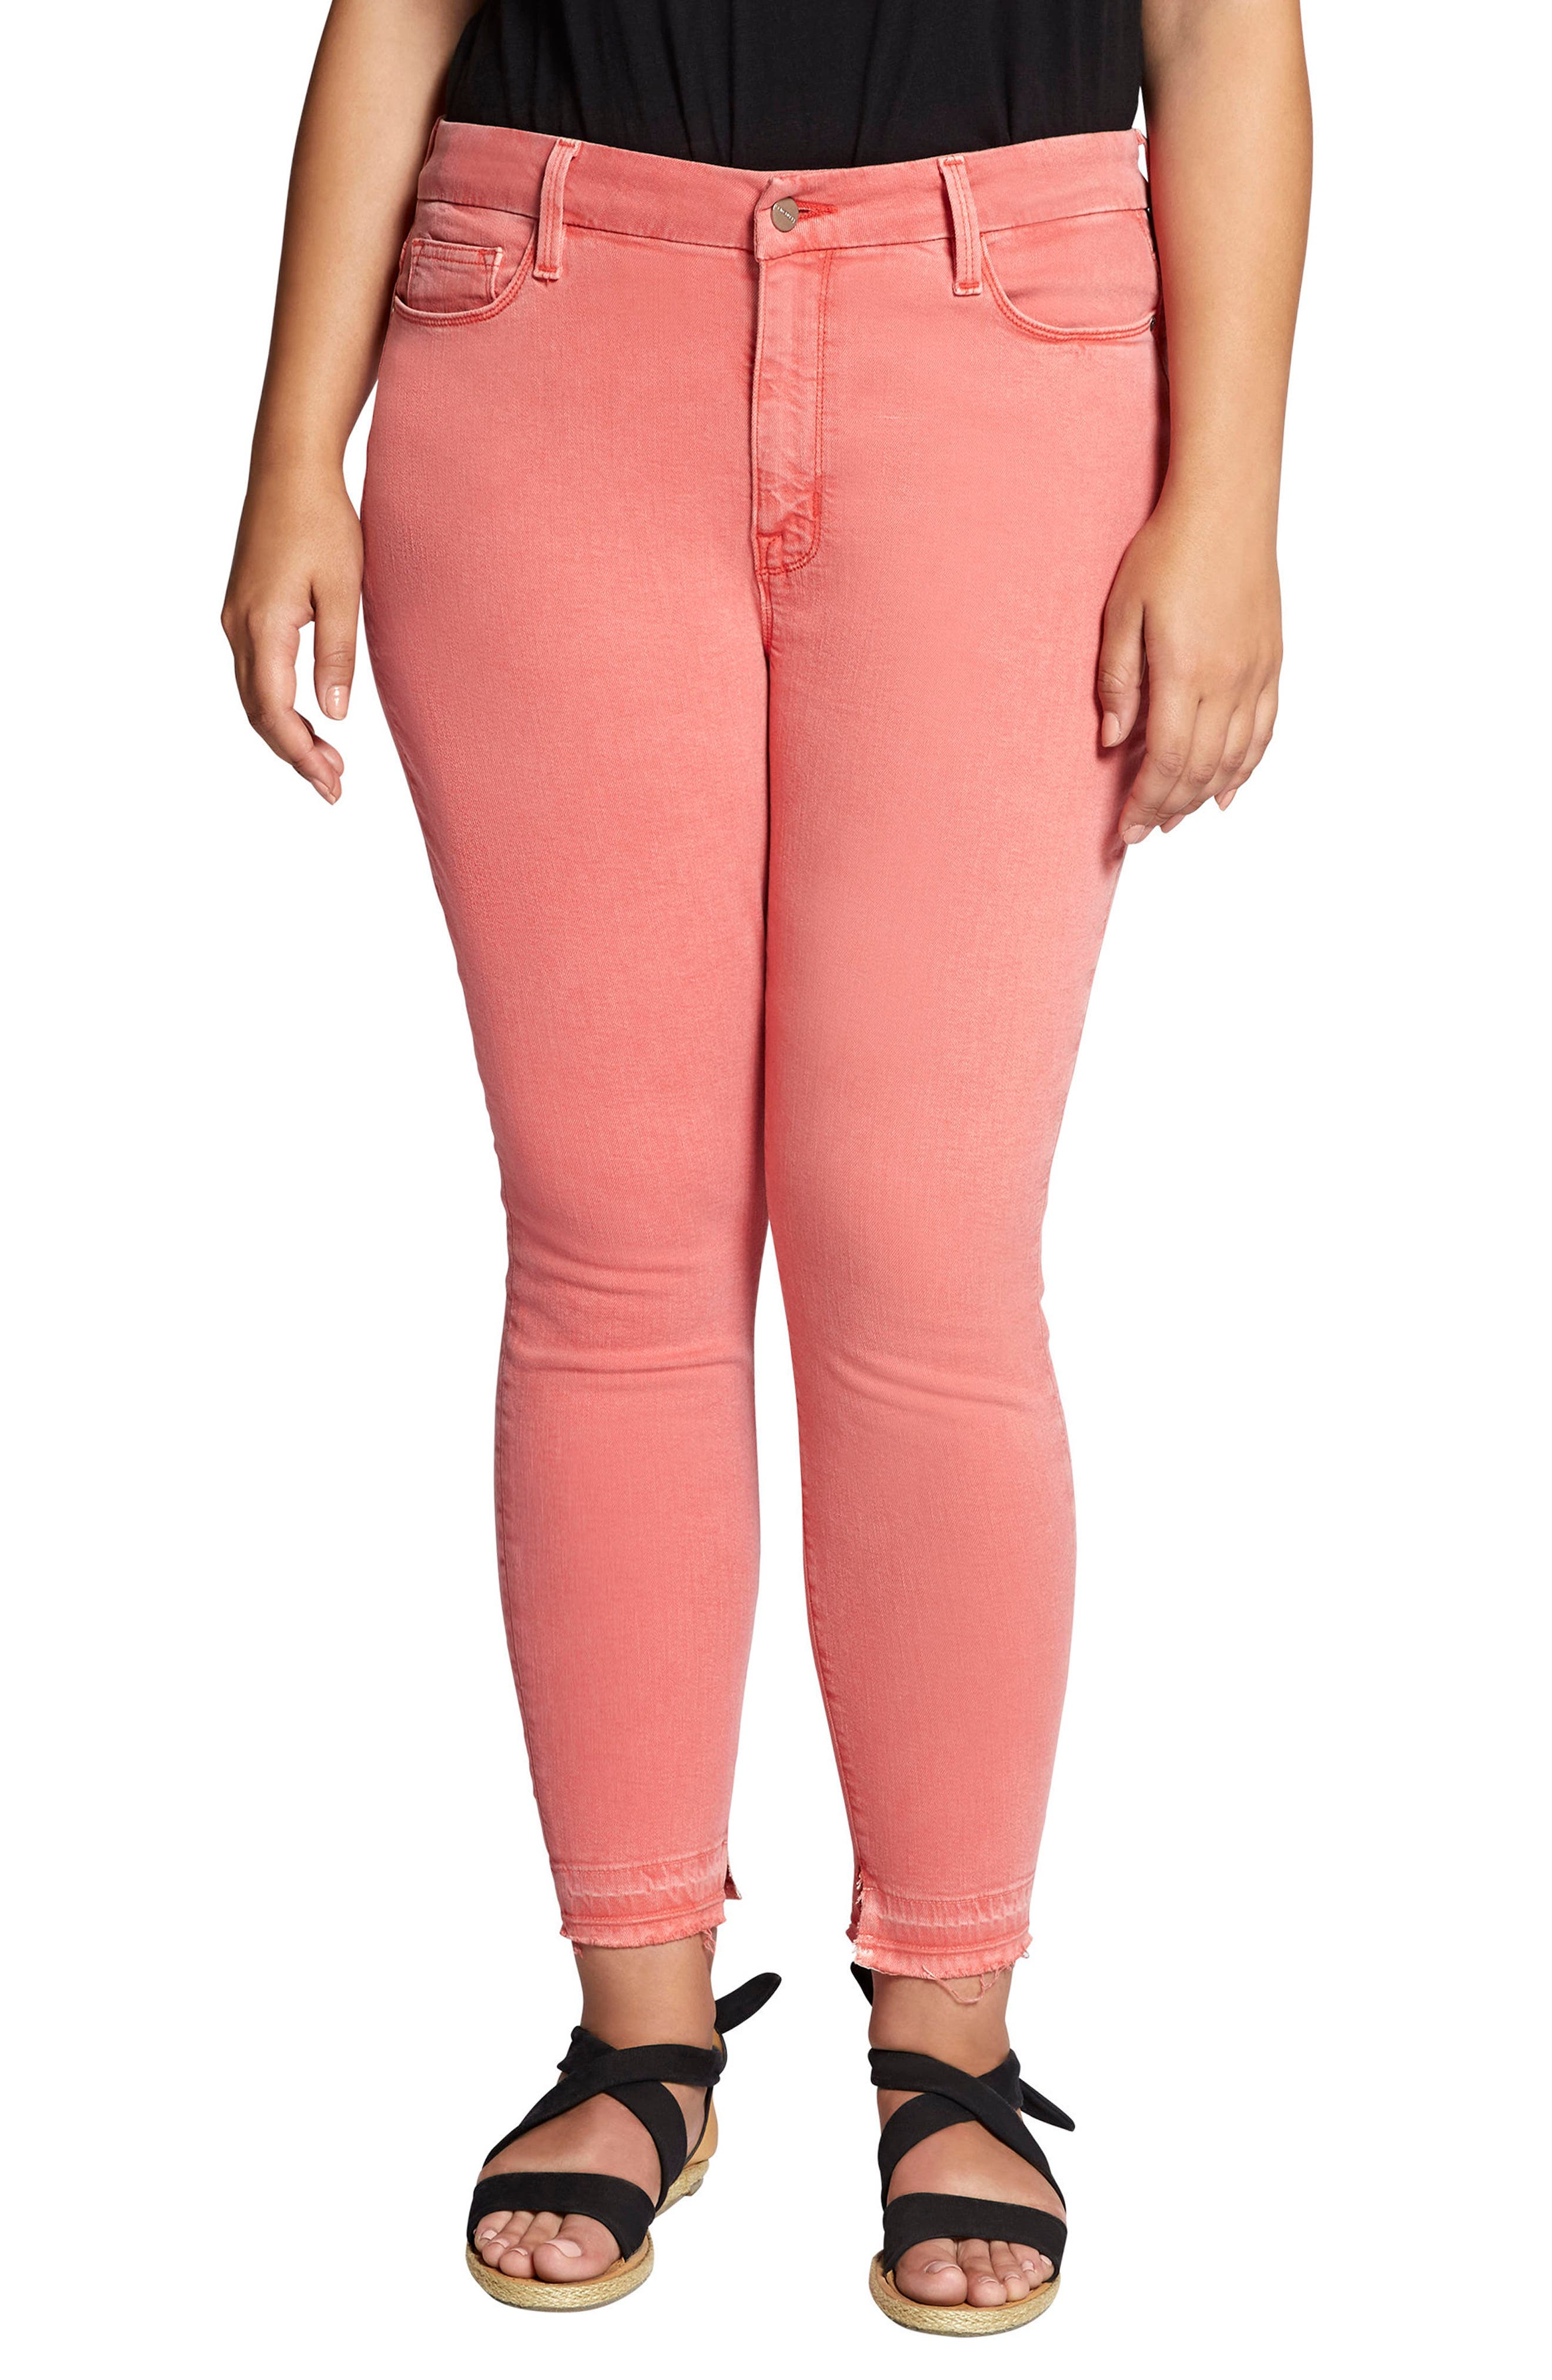 Saige Release Hem Curvy Fit Skinny Jeans,                             Main thumbnail 1, color,                             Chili Wash